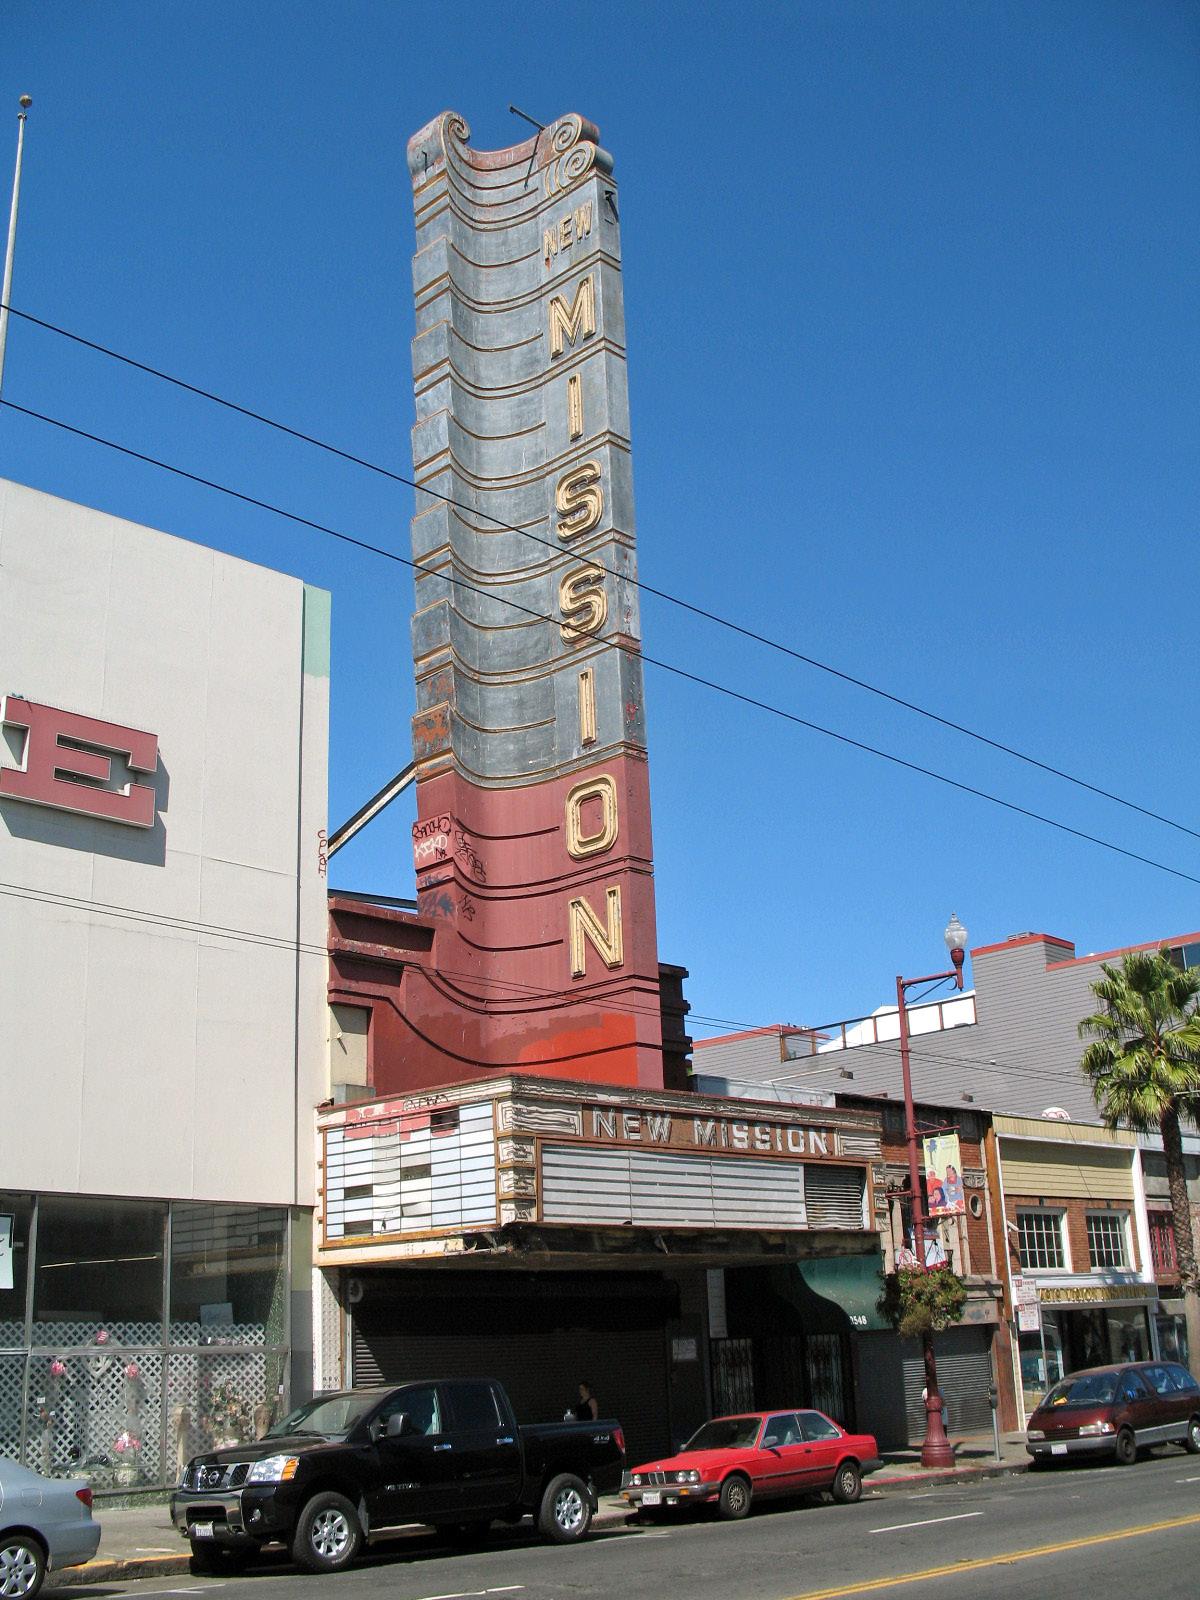 Alamo Drafthouse New Mission Cinema - Wikidata